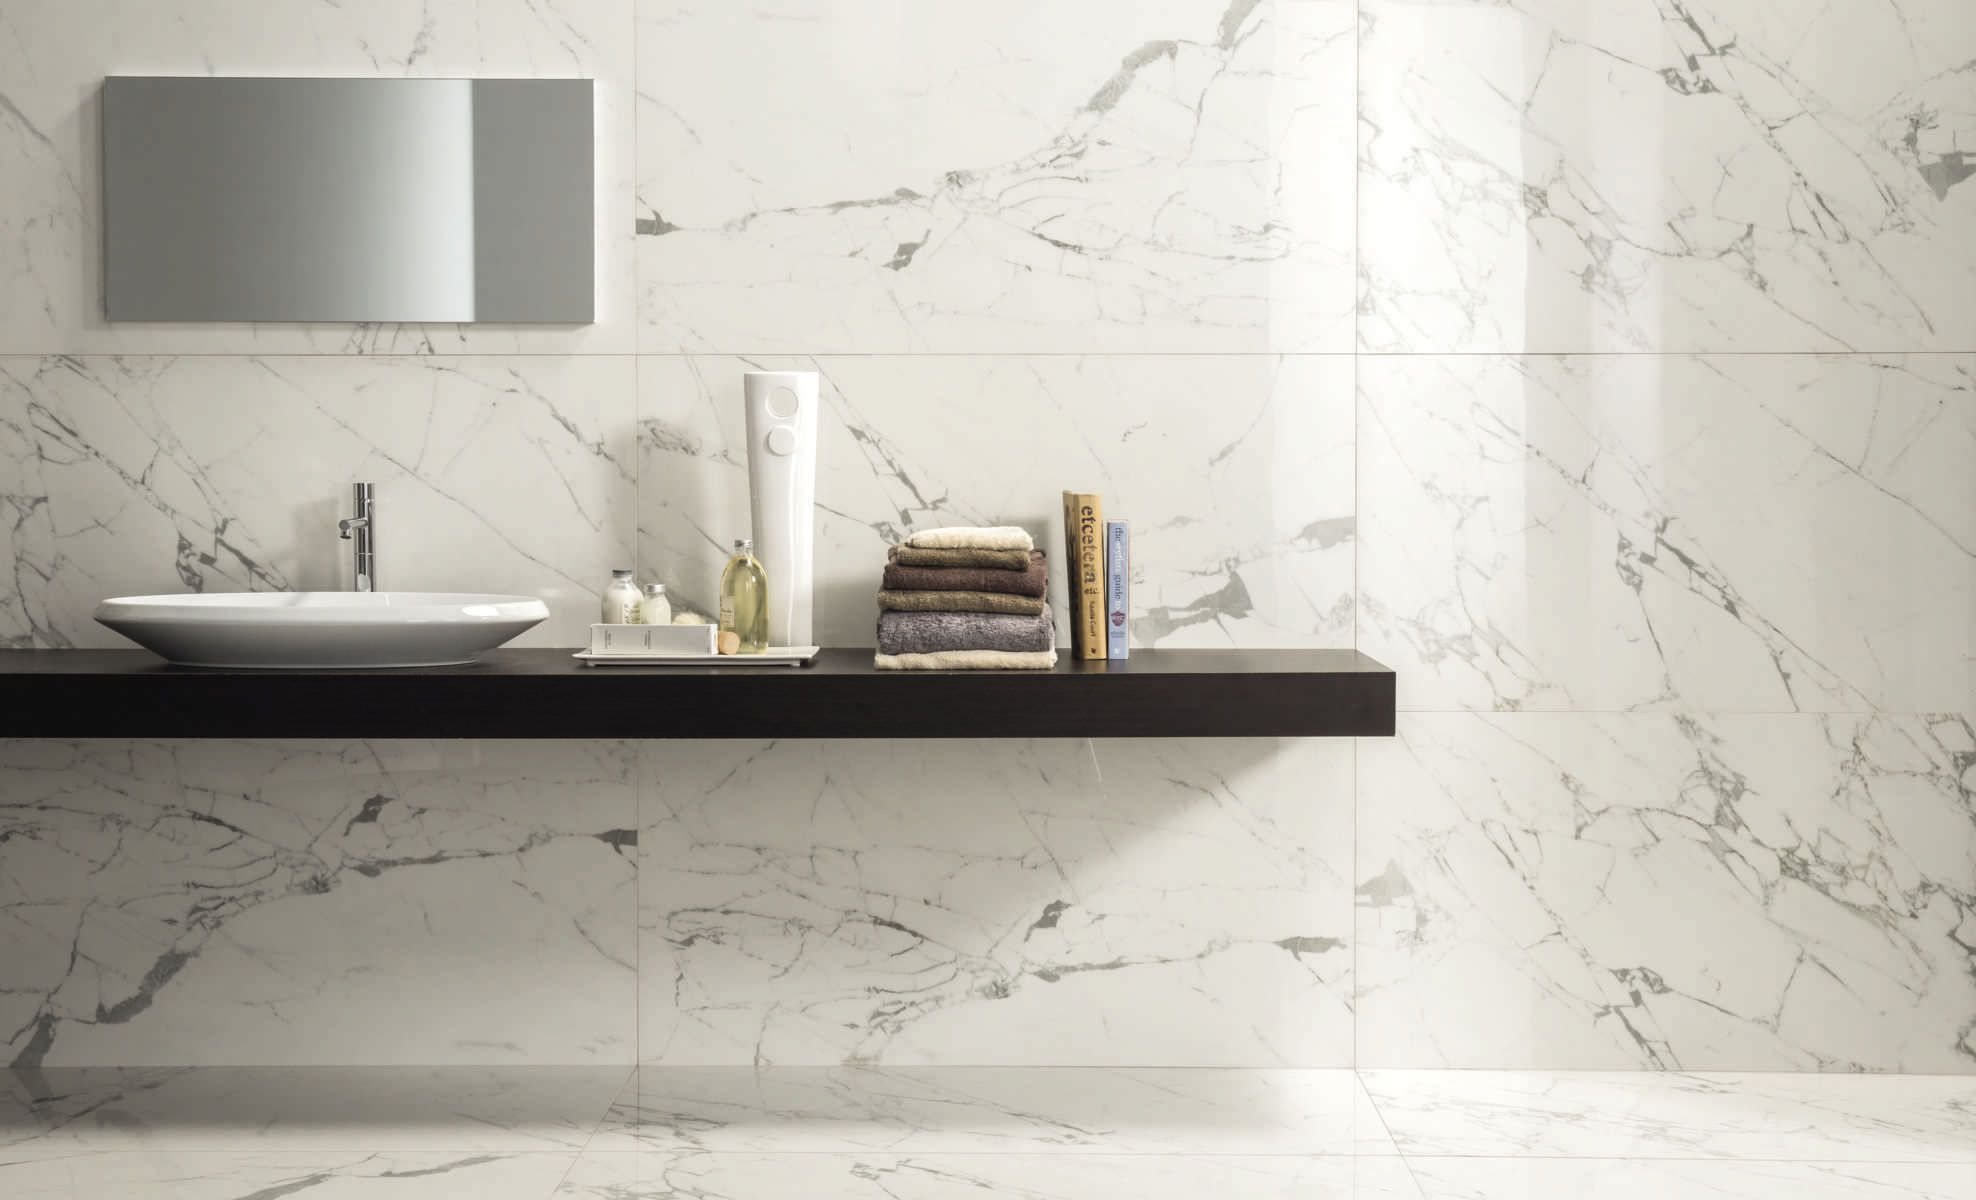 Marble Porcelain Tile Bathroom Google Search Bathroom Inspiration Pinterest Bathroom